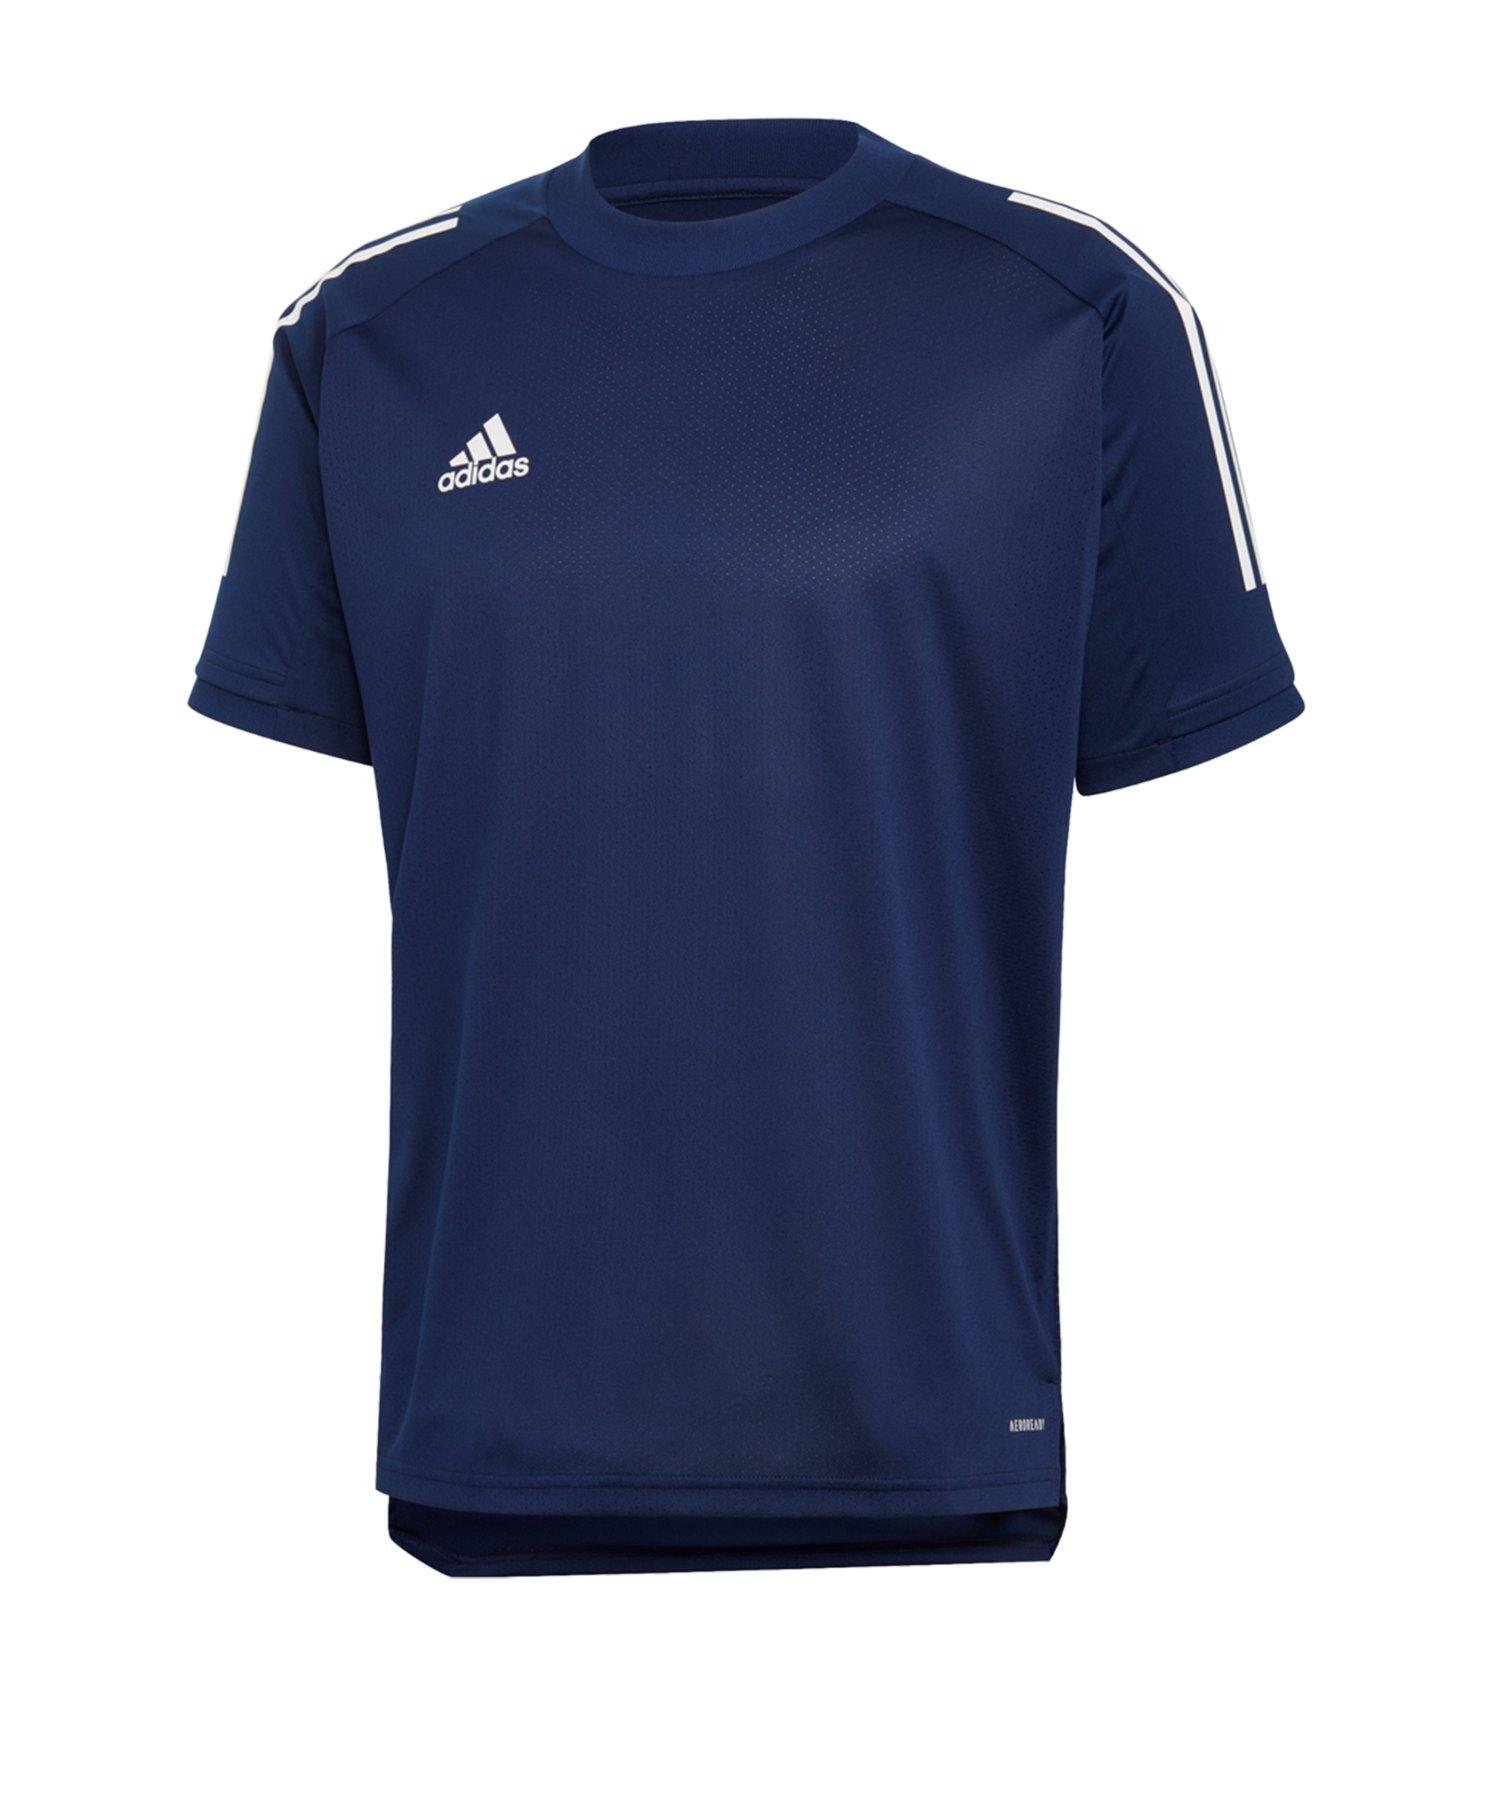 adidas Condivo 20 TR Shirt kurzarm Blau Weiss - blau